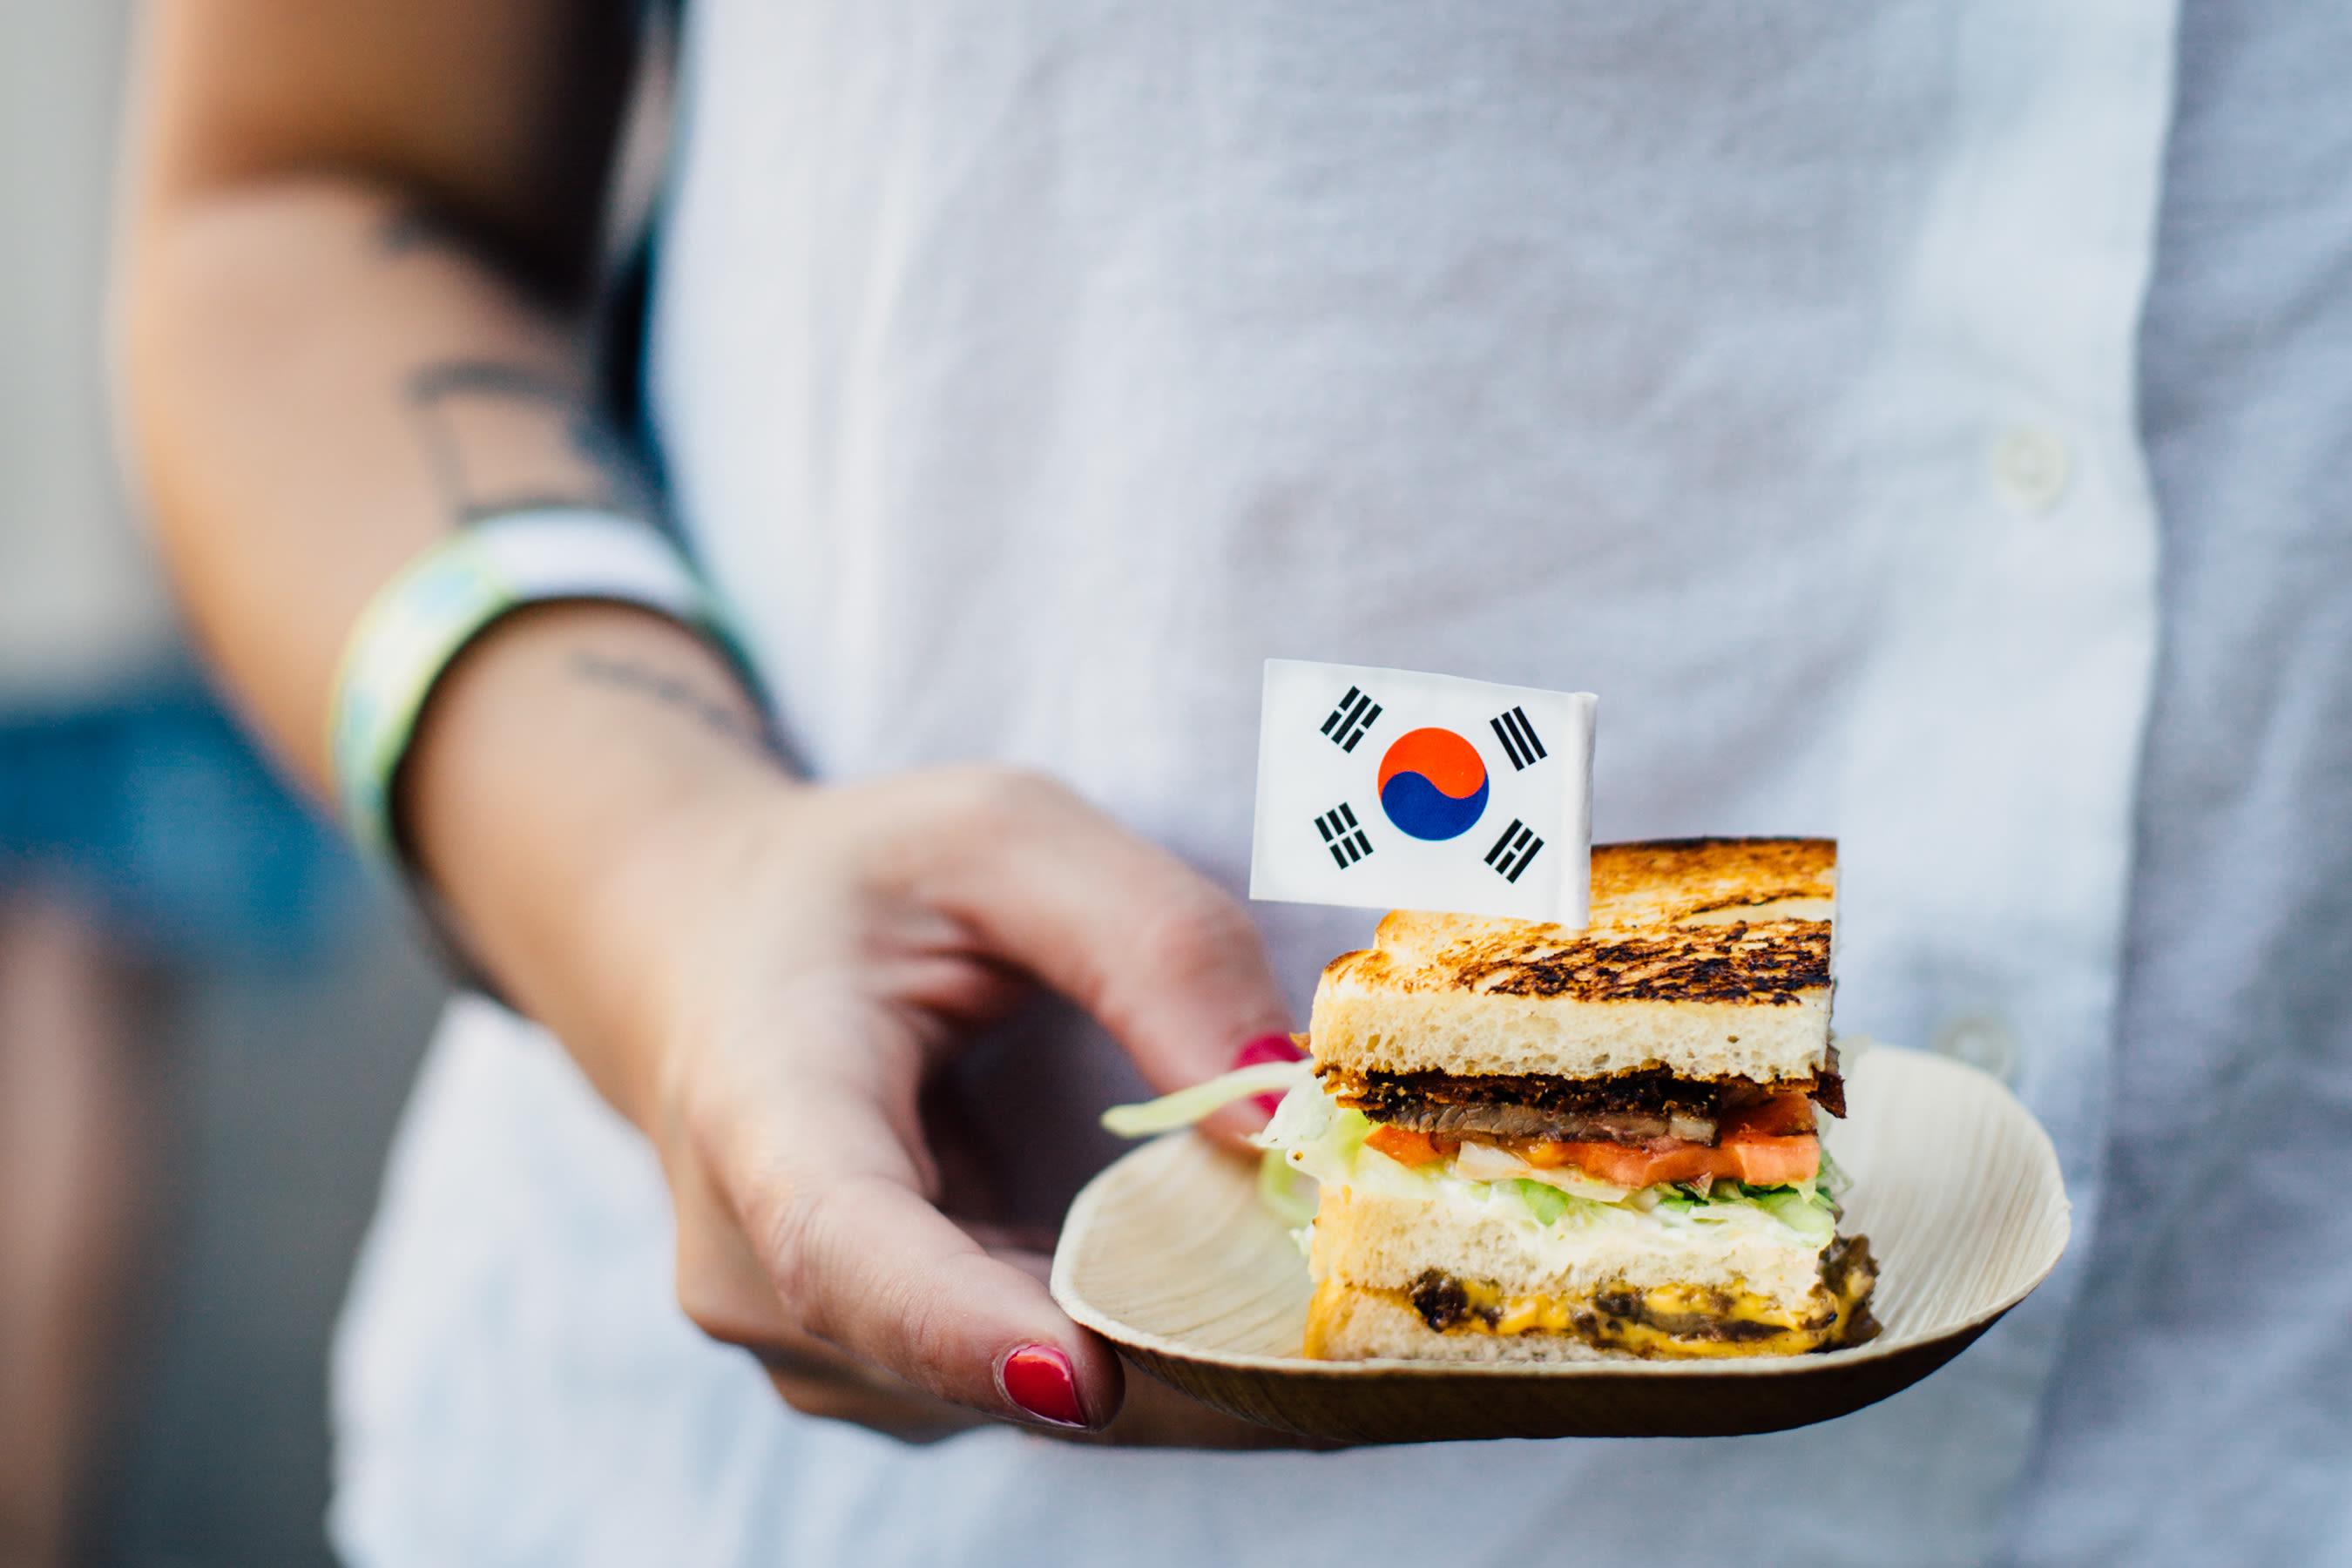 Feast2016 sandwich brookebass 4 nbltea